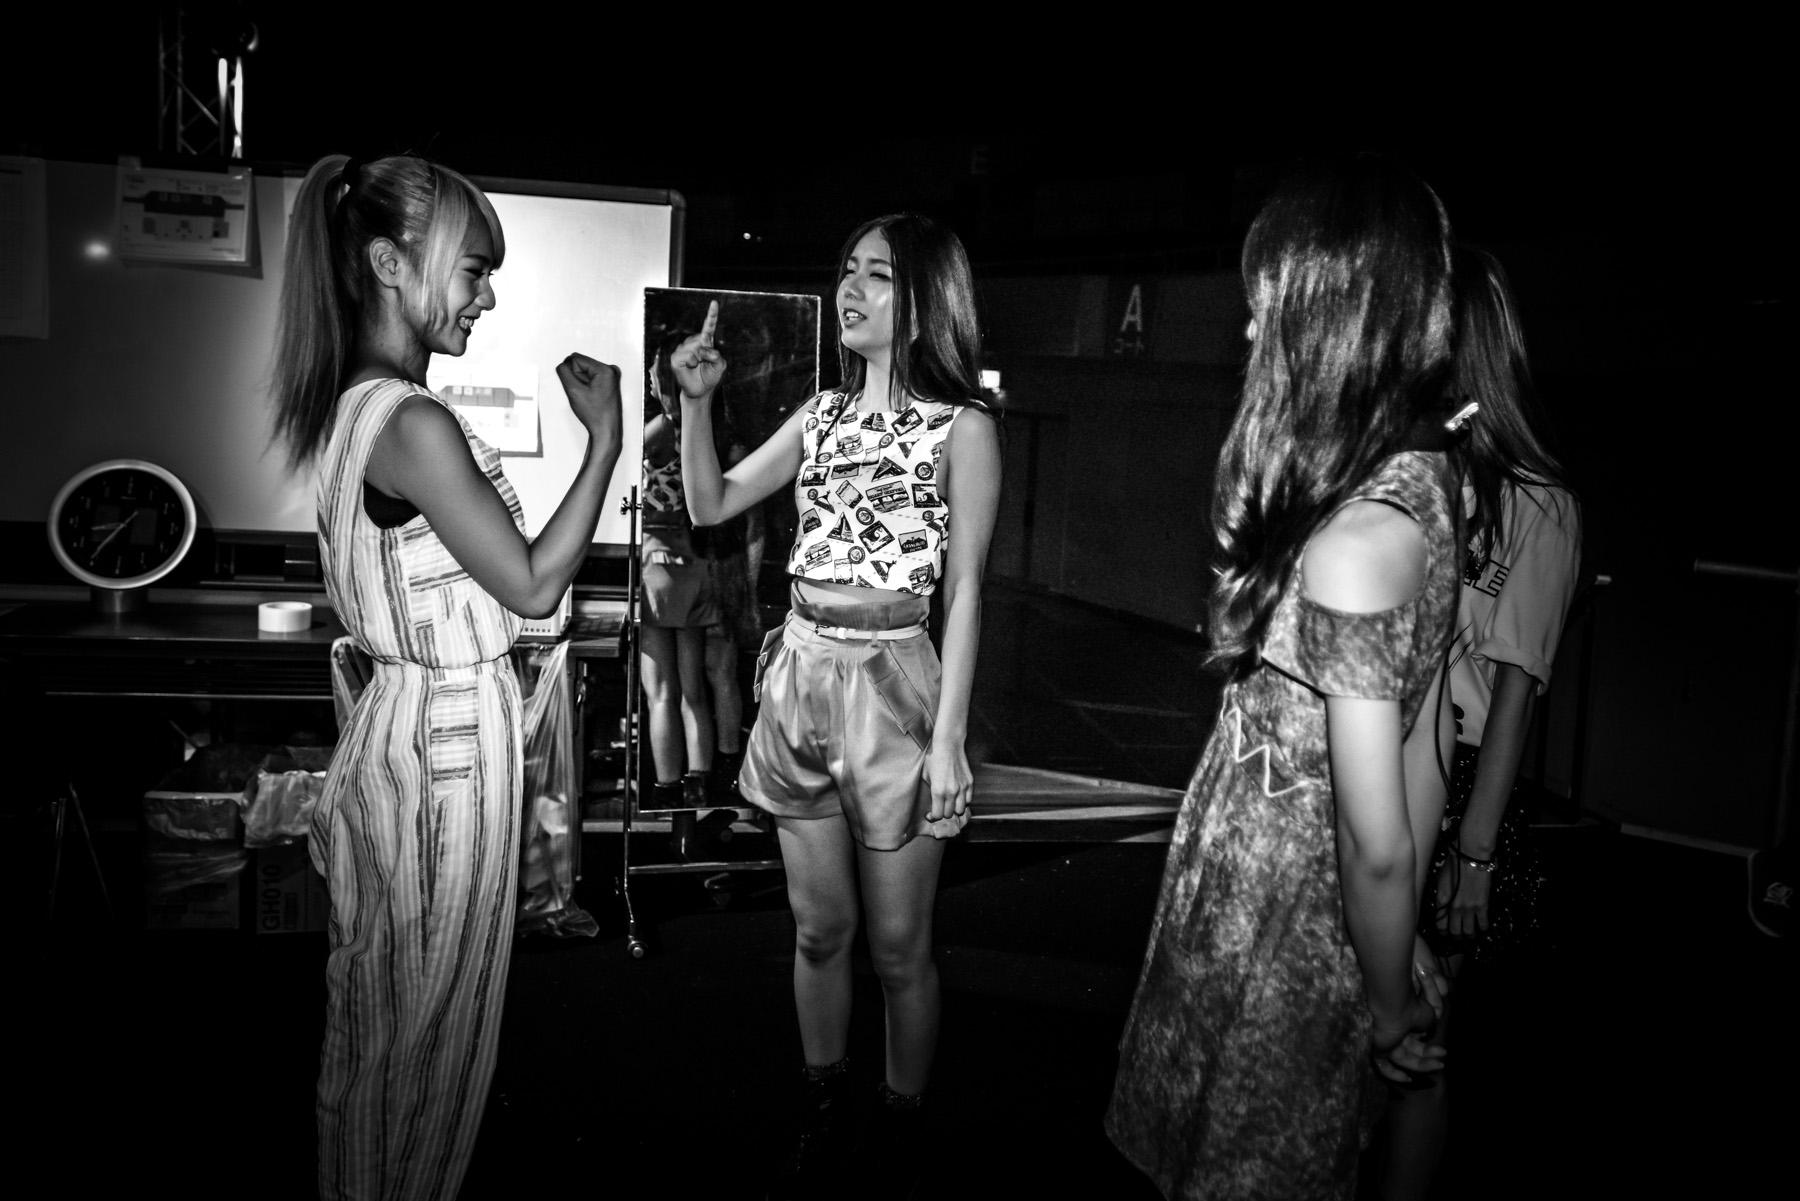 Shin Nakajima Photography A07c17_707d979703f9d19208d76af84e304882